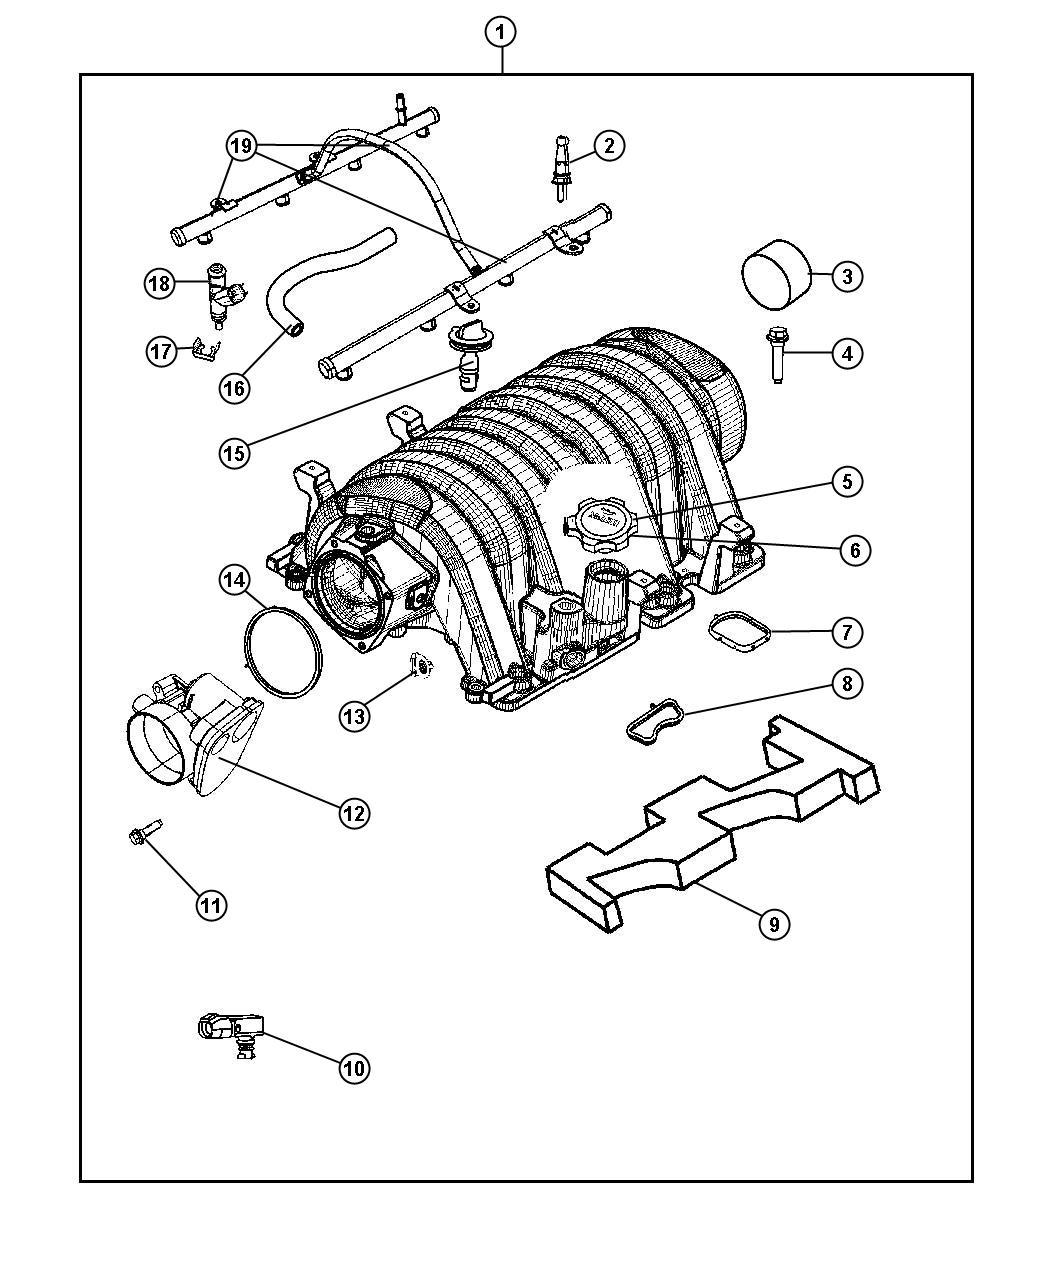 Dodge Charger Manifold Intake